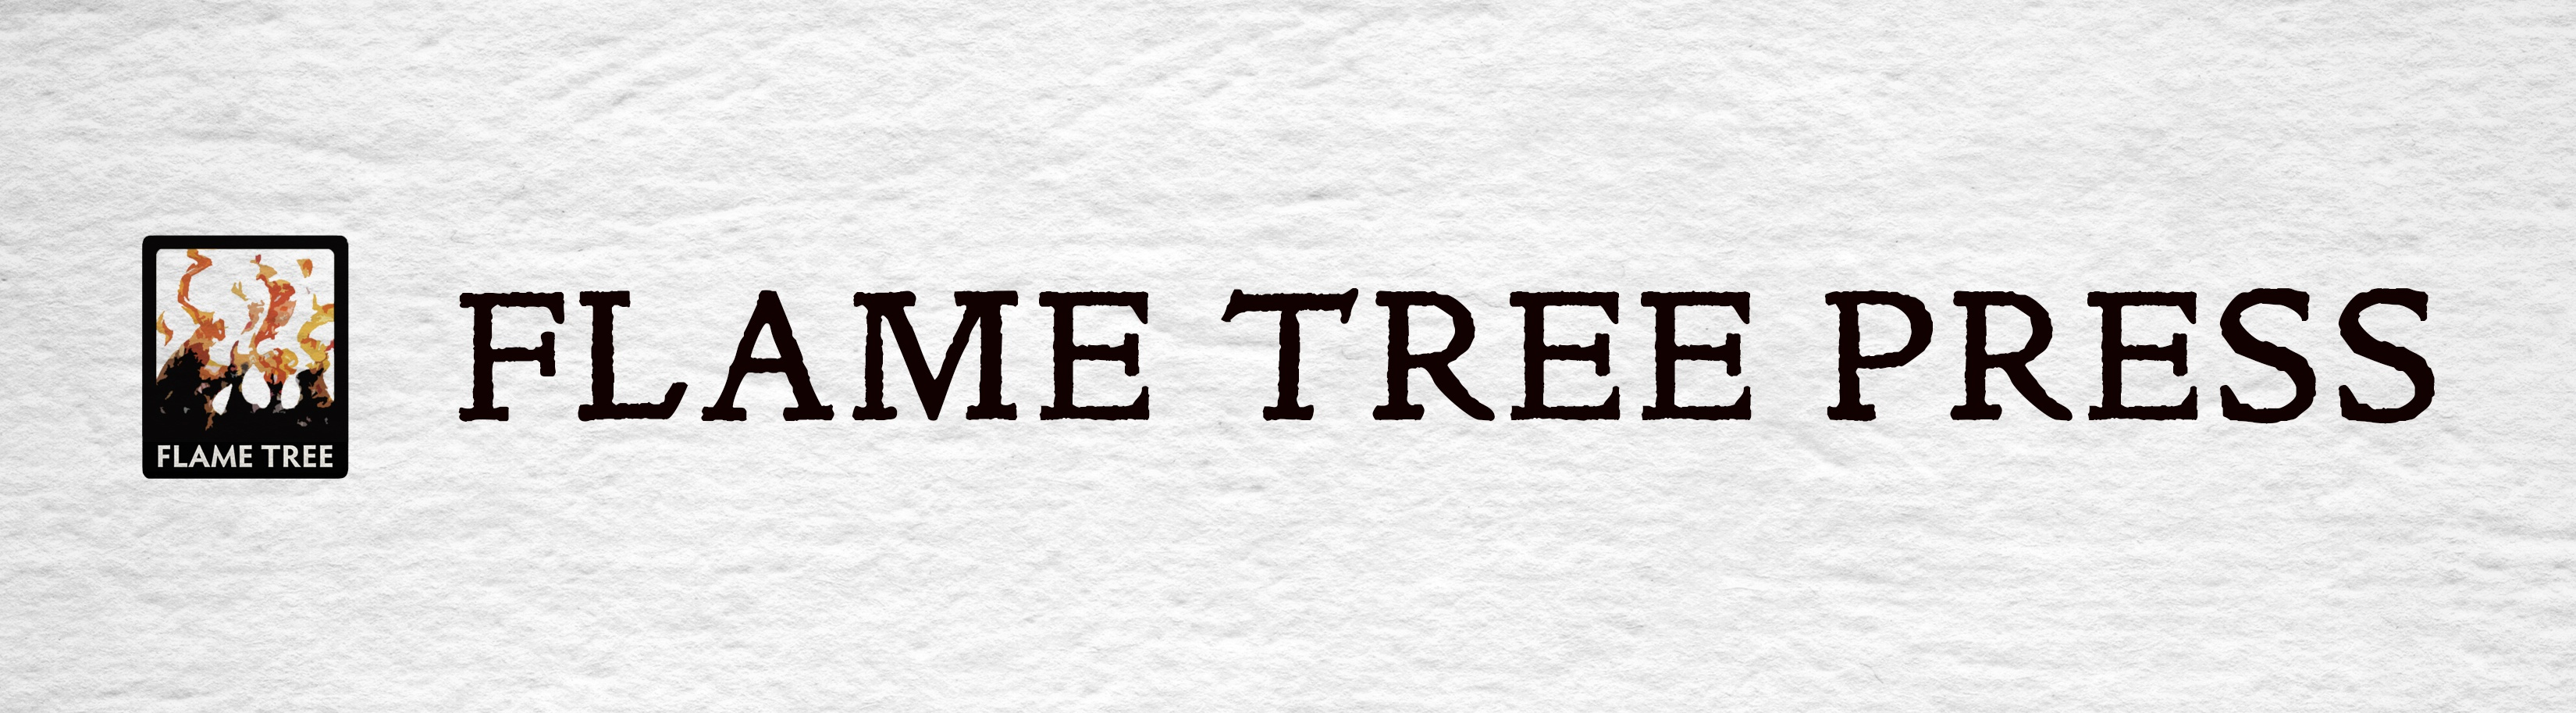 Flame_Tree_Press_with_logo.jpeg